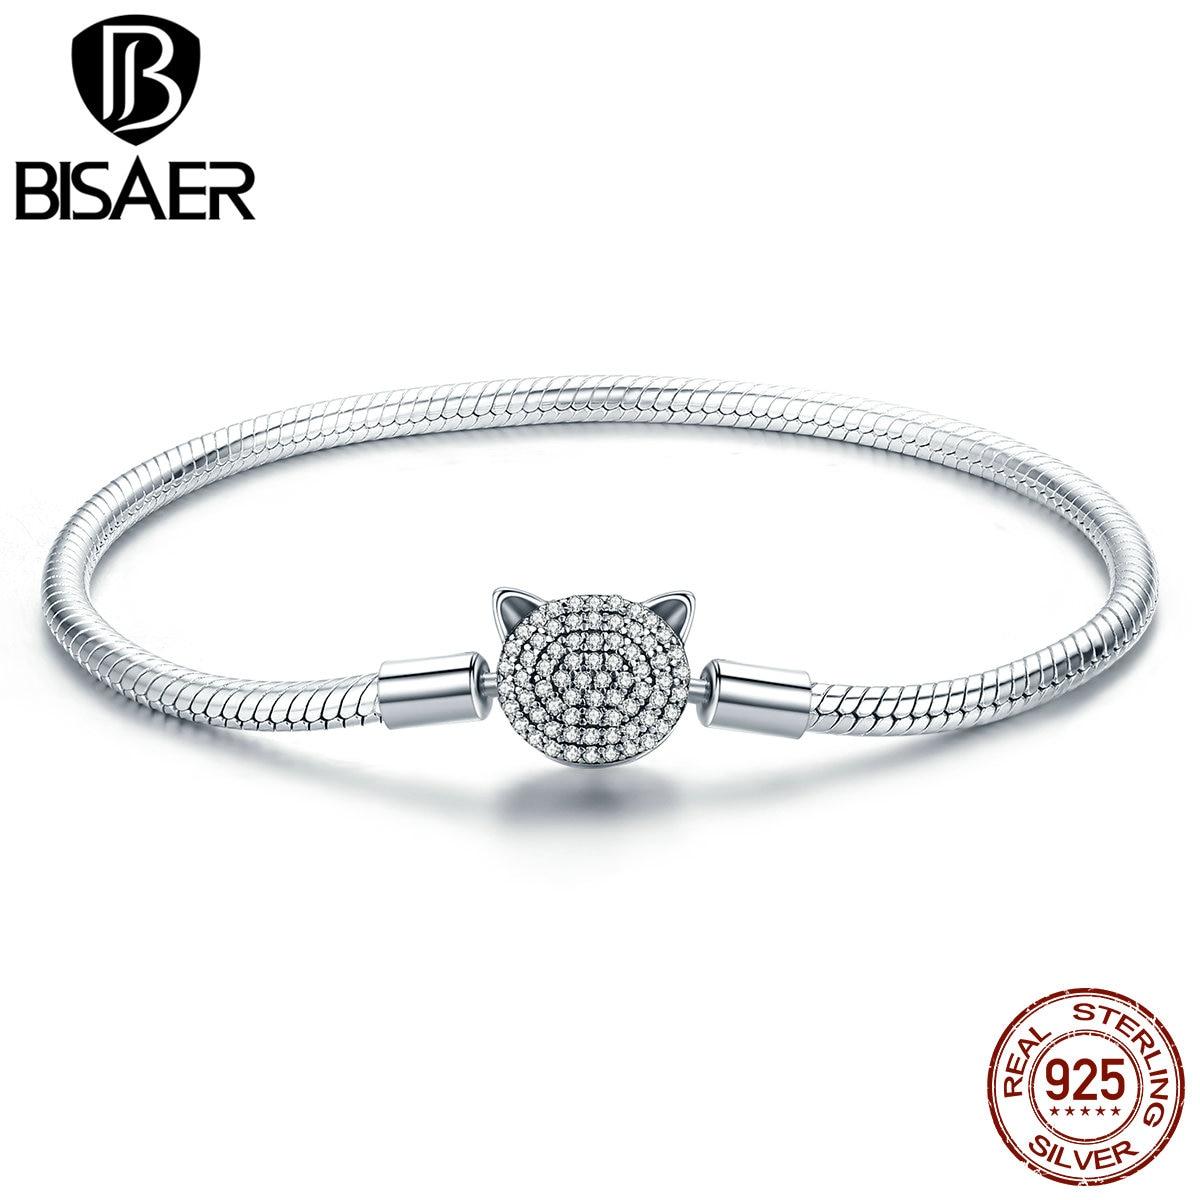 100% 925 Sterling Silber Schöne Tier Frech Katze Silber Schlange Verschluss Charme Armbänder Frauen Armband Mädchen Mode Schmuck